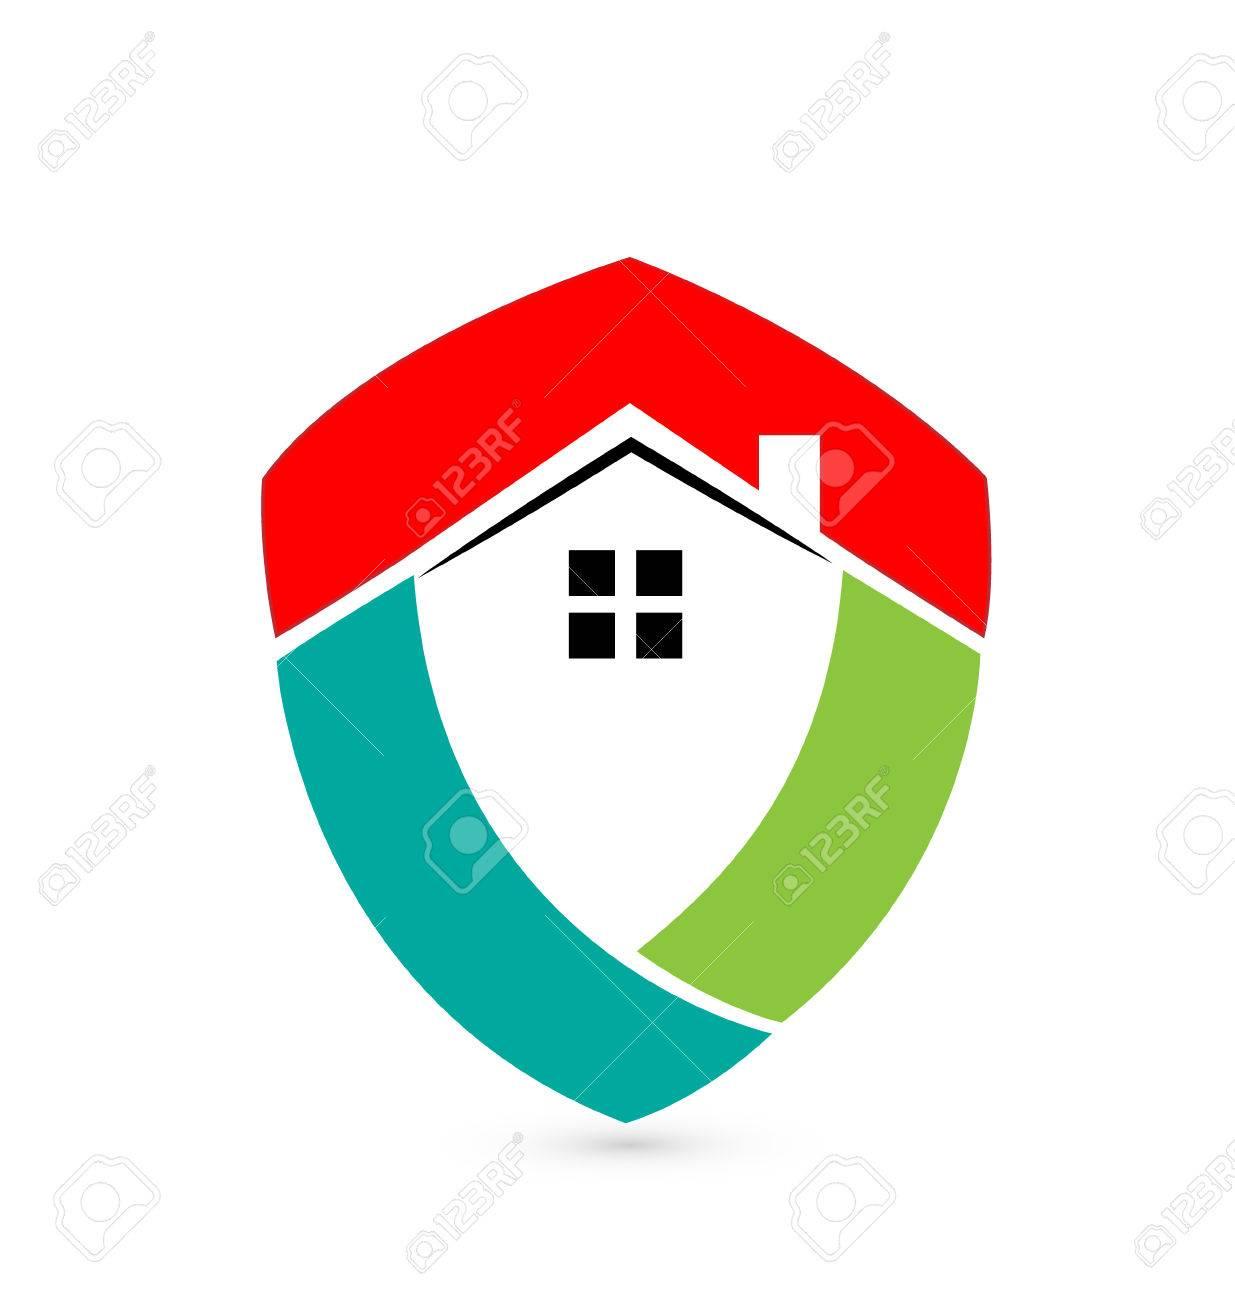 Shield House shield house - home design